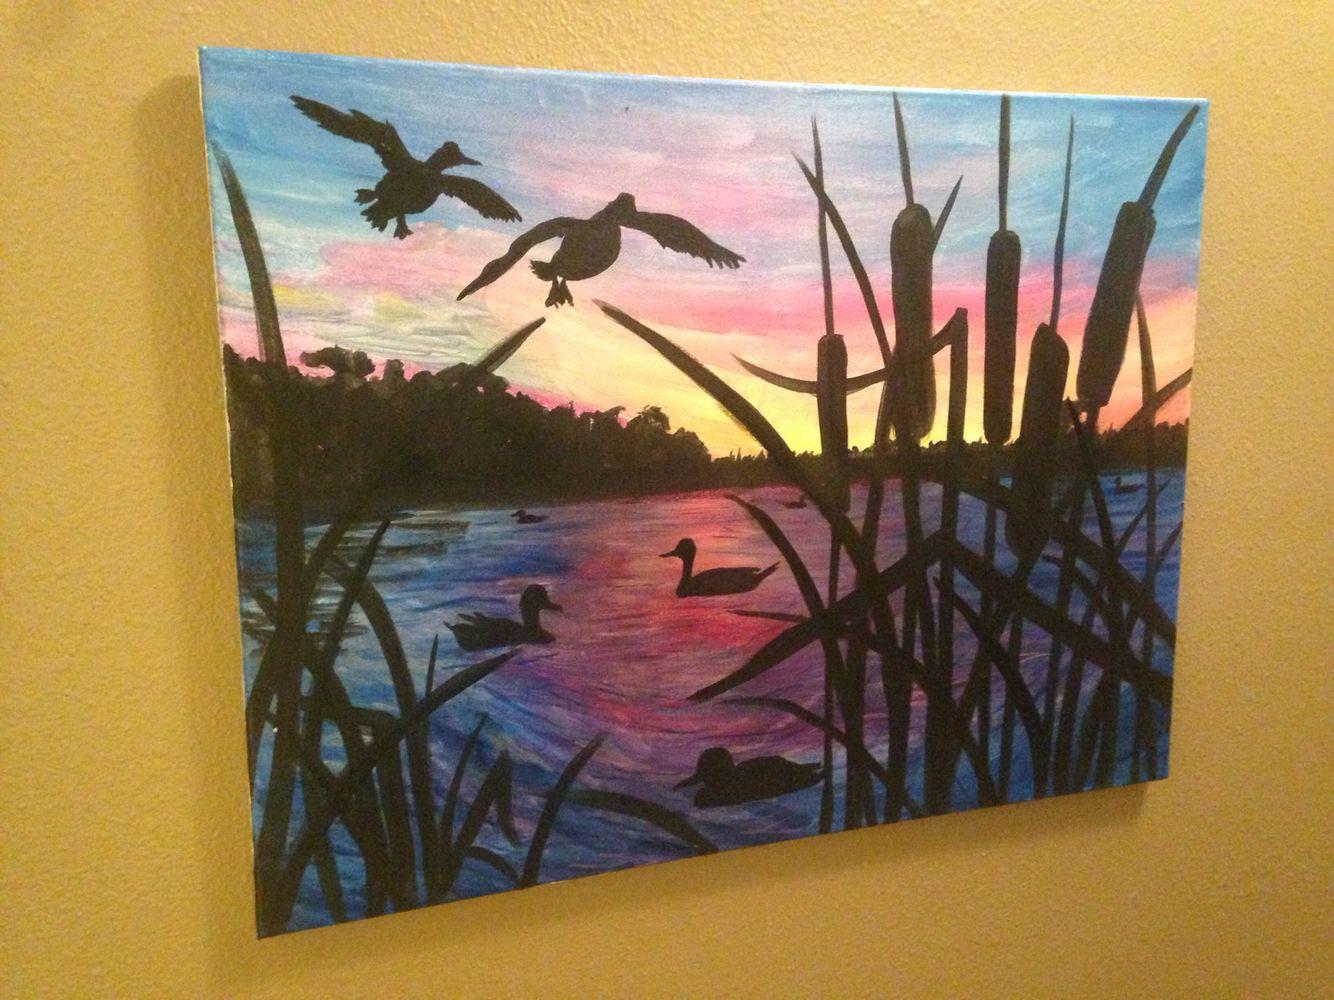 Louisiana duck hunting acrylic painting. #canvasesbychloe